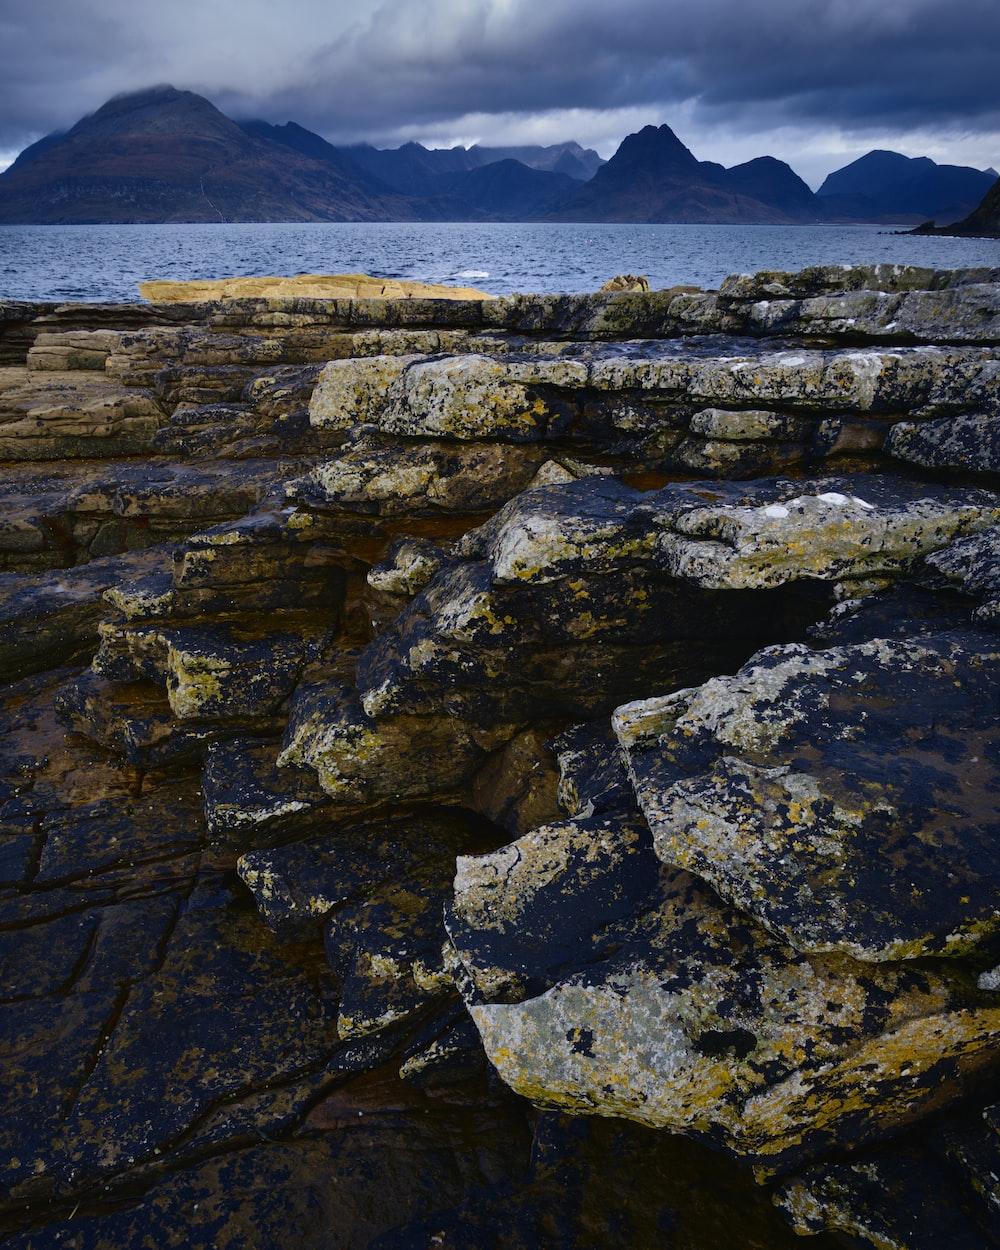 rock formation near calm ocean